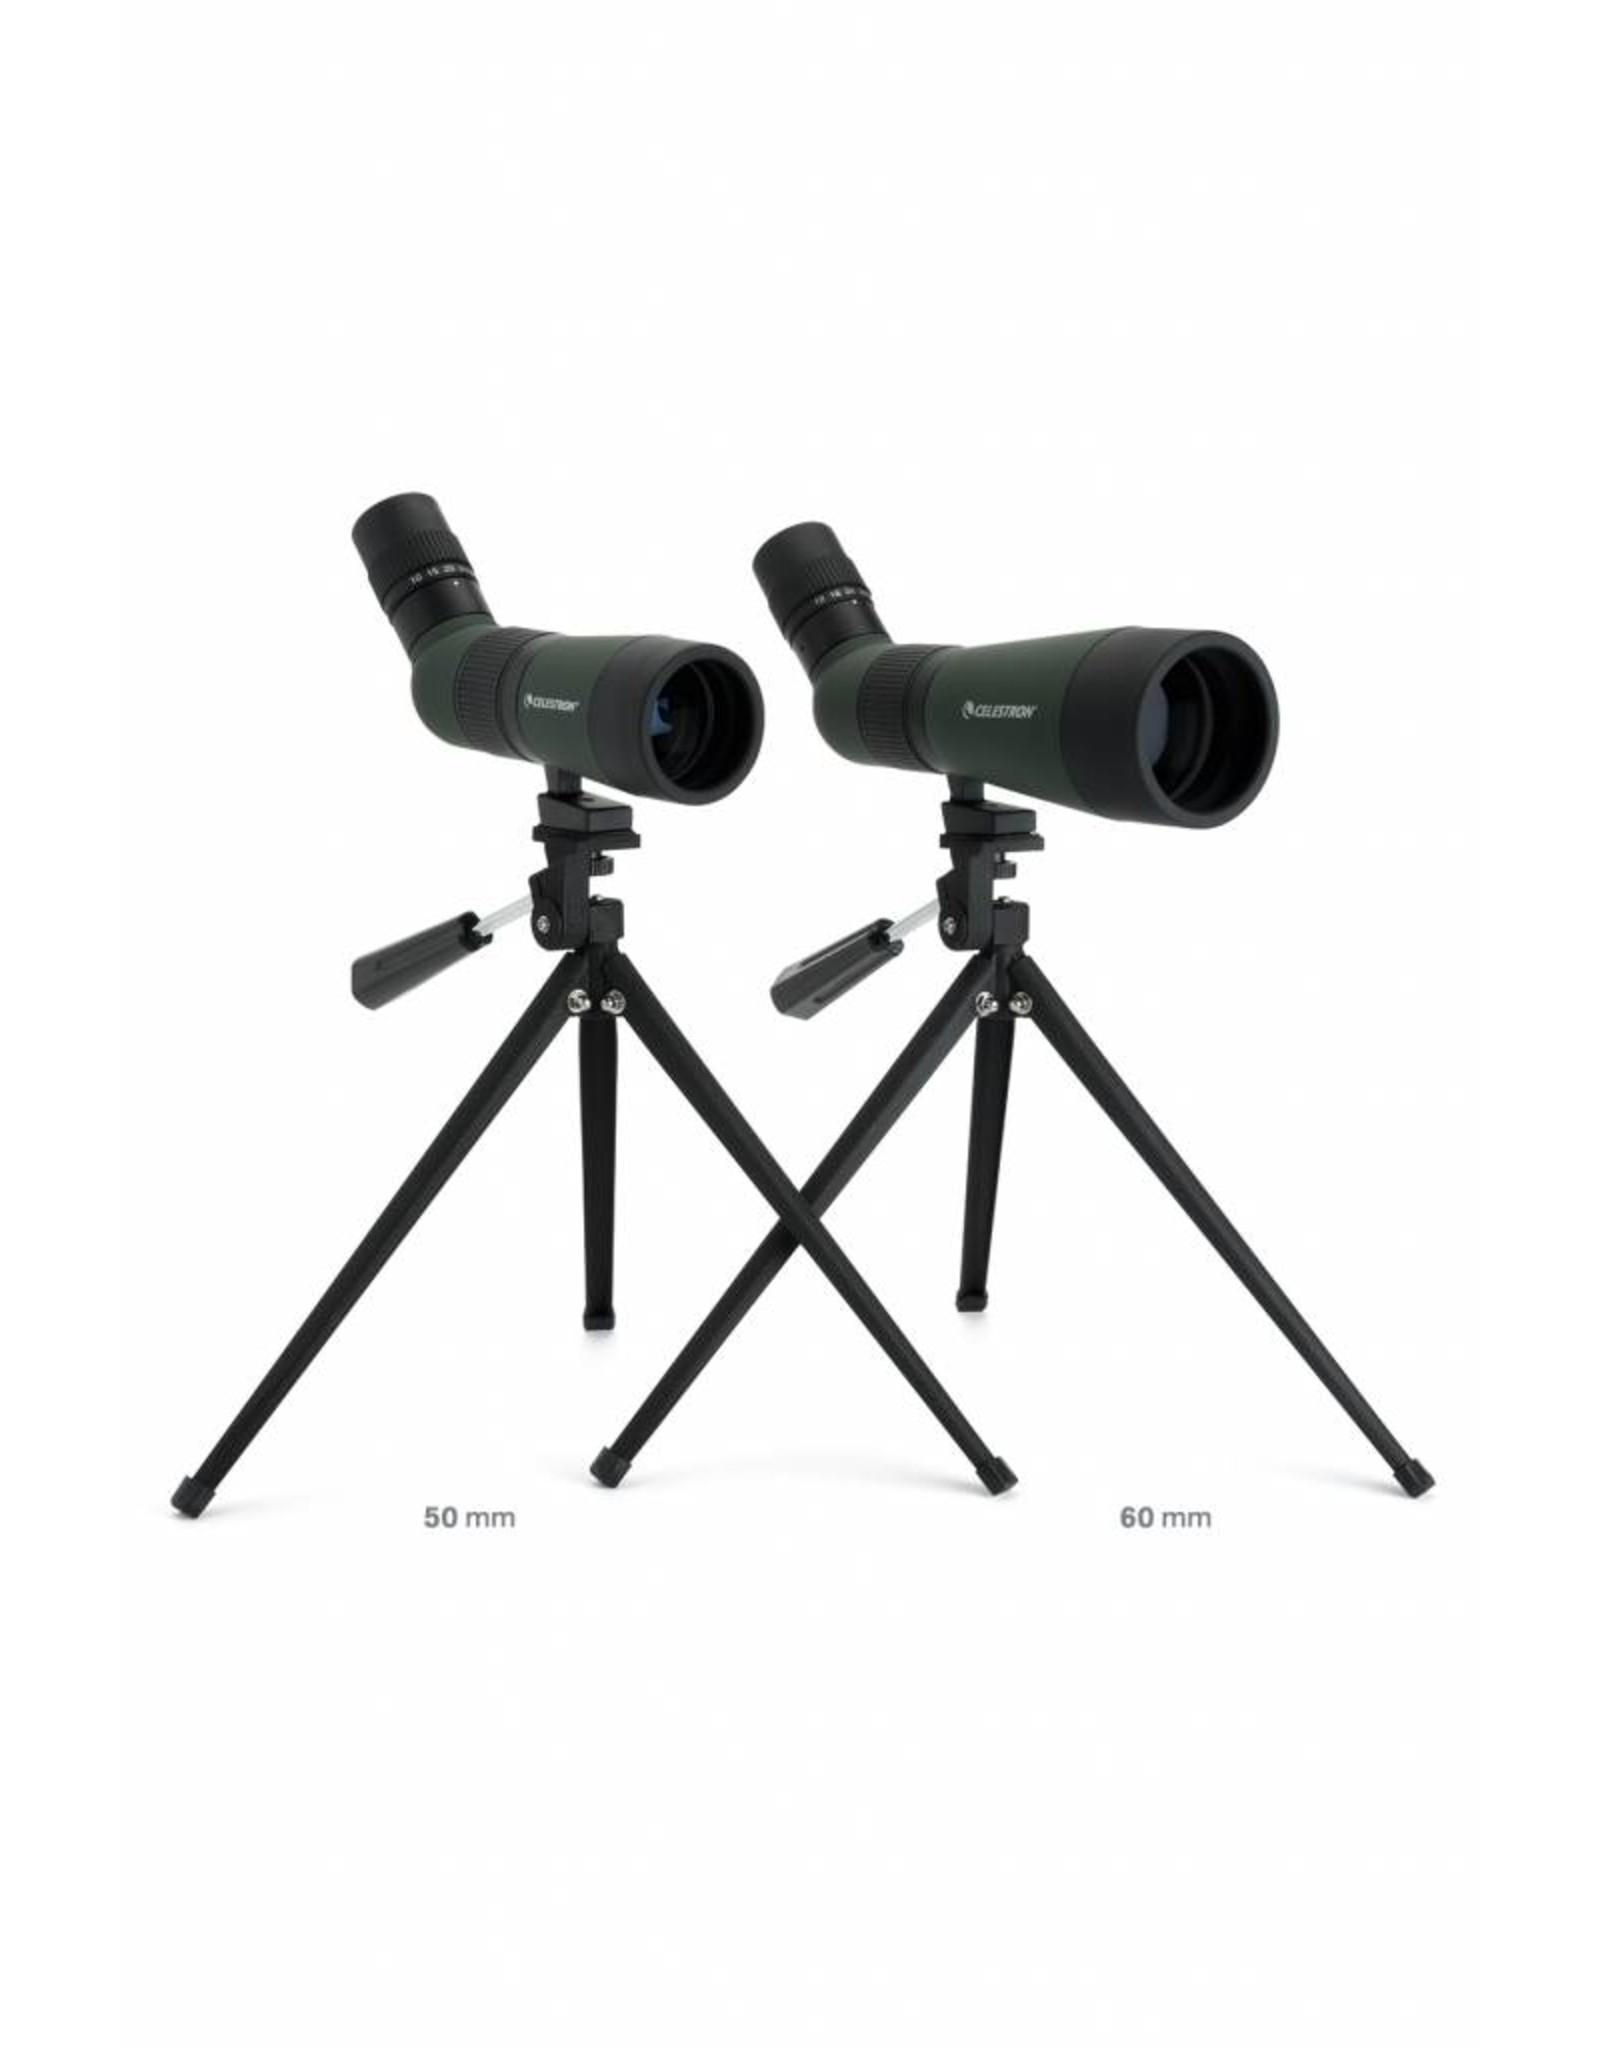 Celestron Celestron LandScout 10-30x50mm Spotting Scope